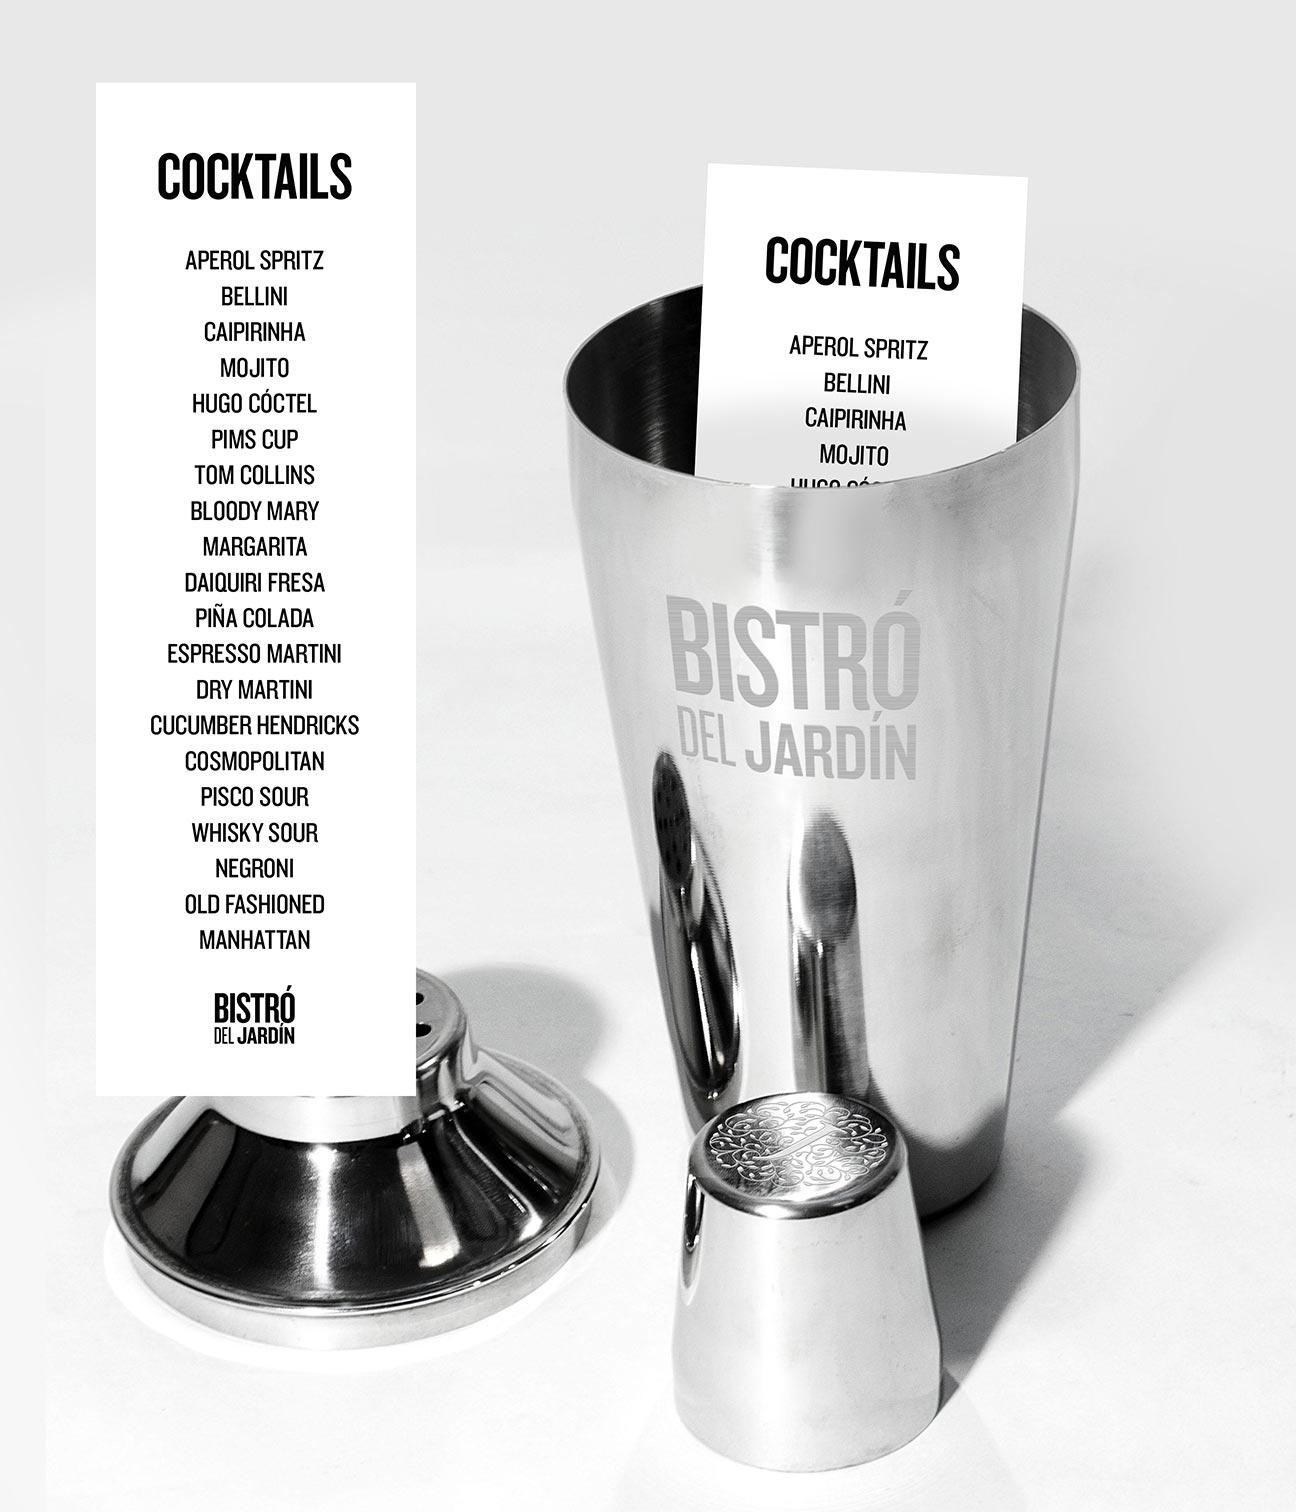 Bistró del Jardín - Carta de cocktails